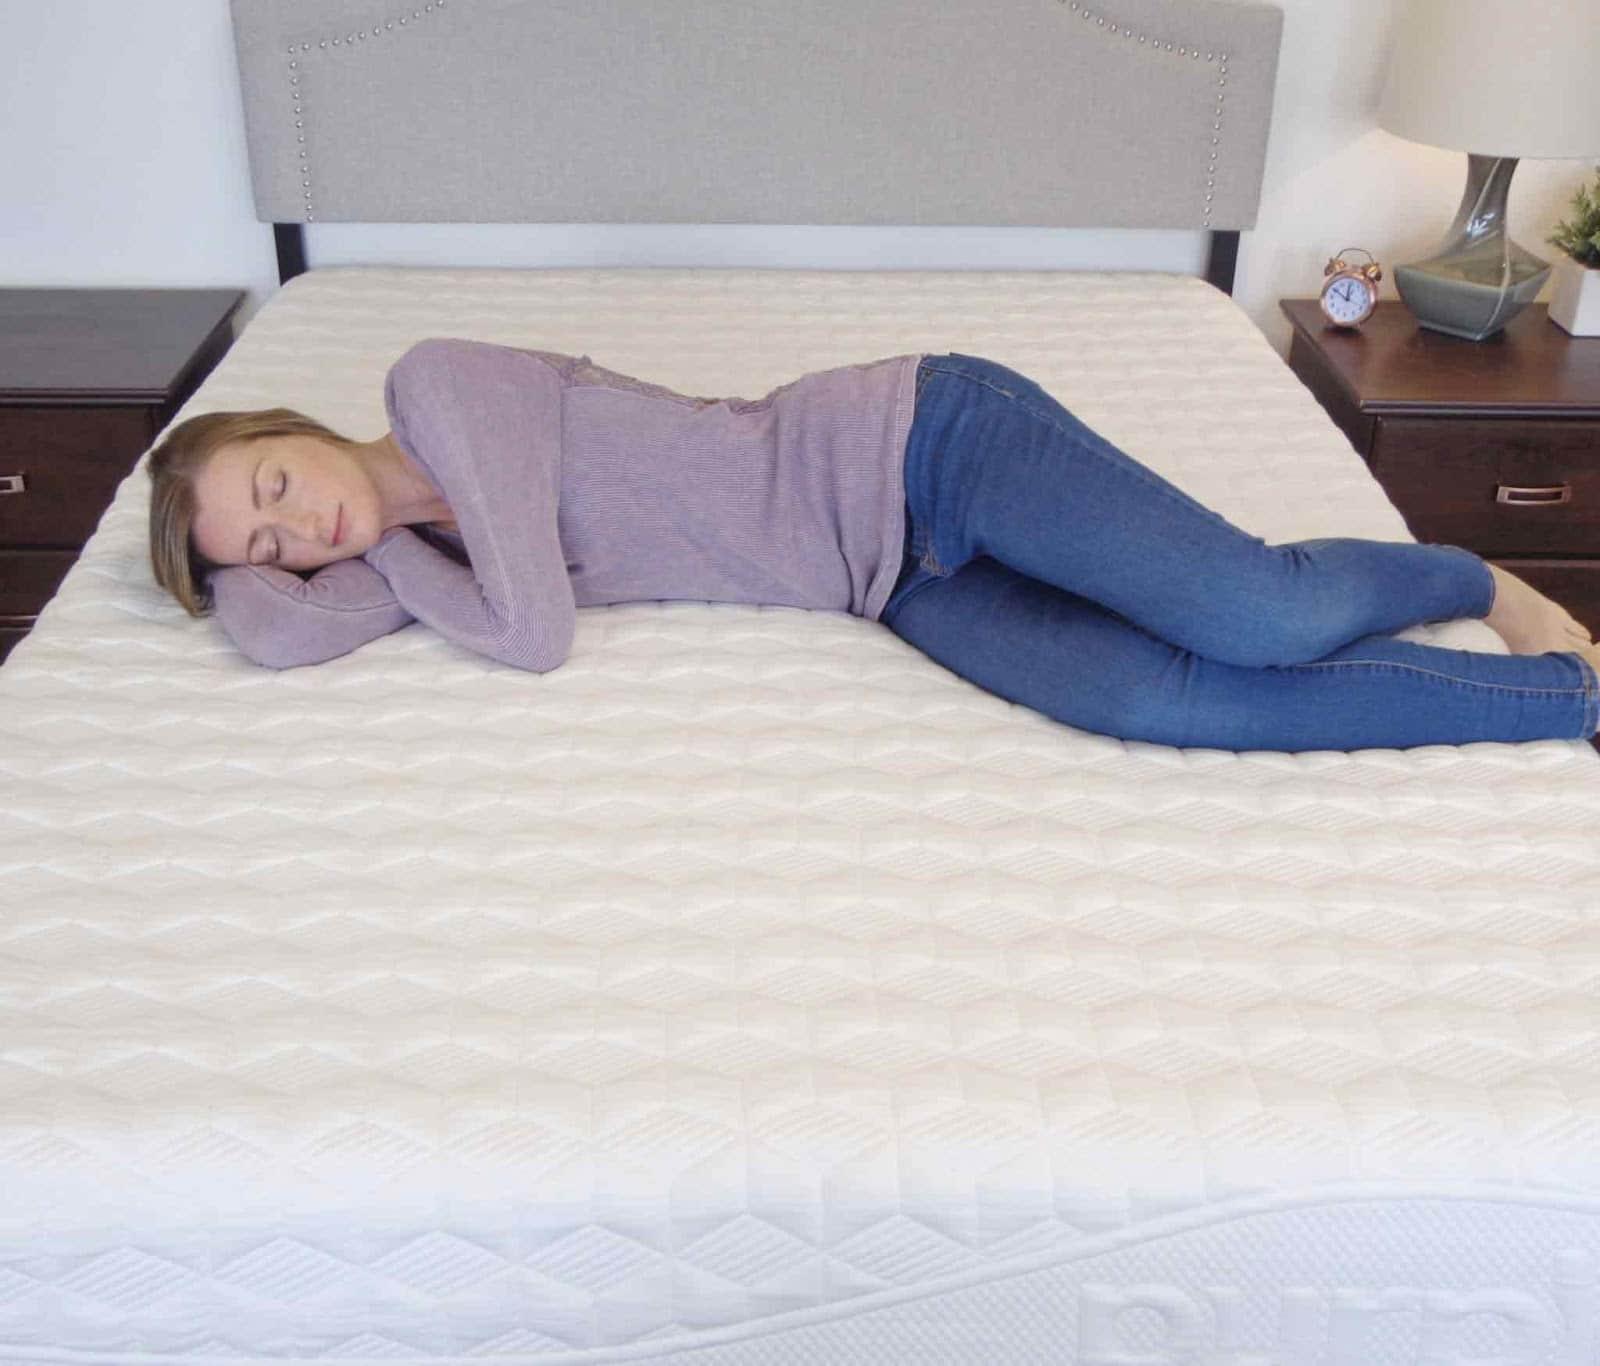 original mattress vs cocoon chill